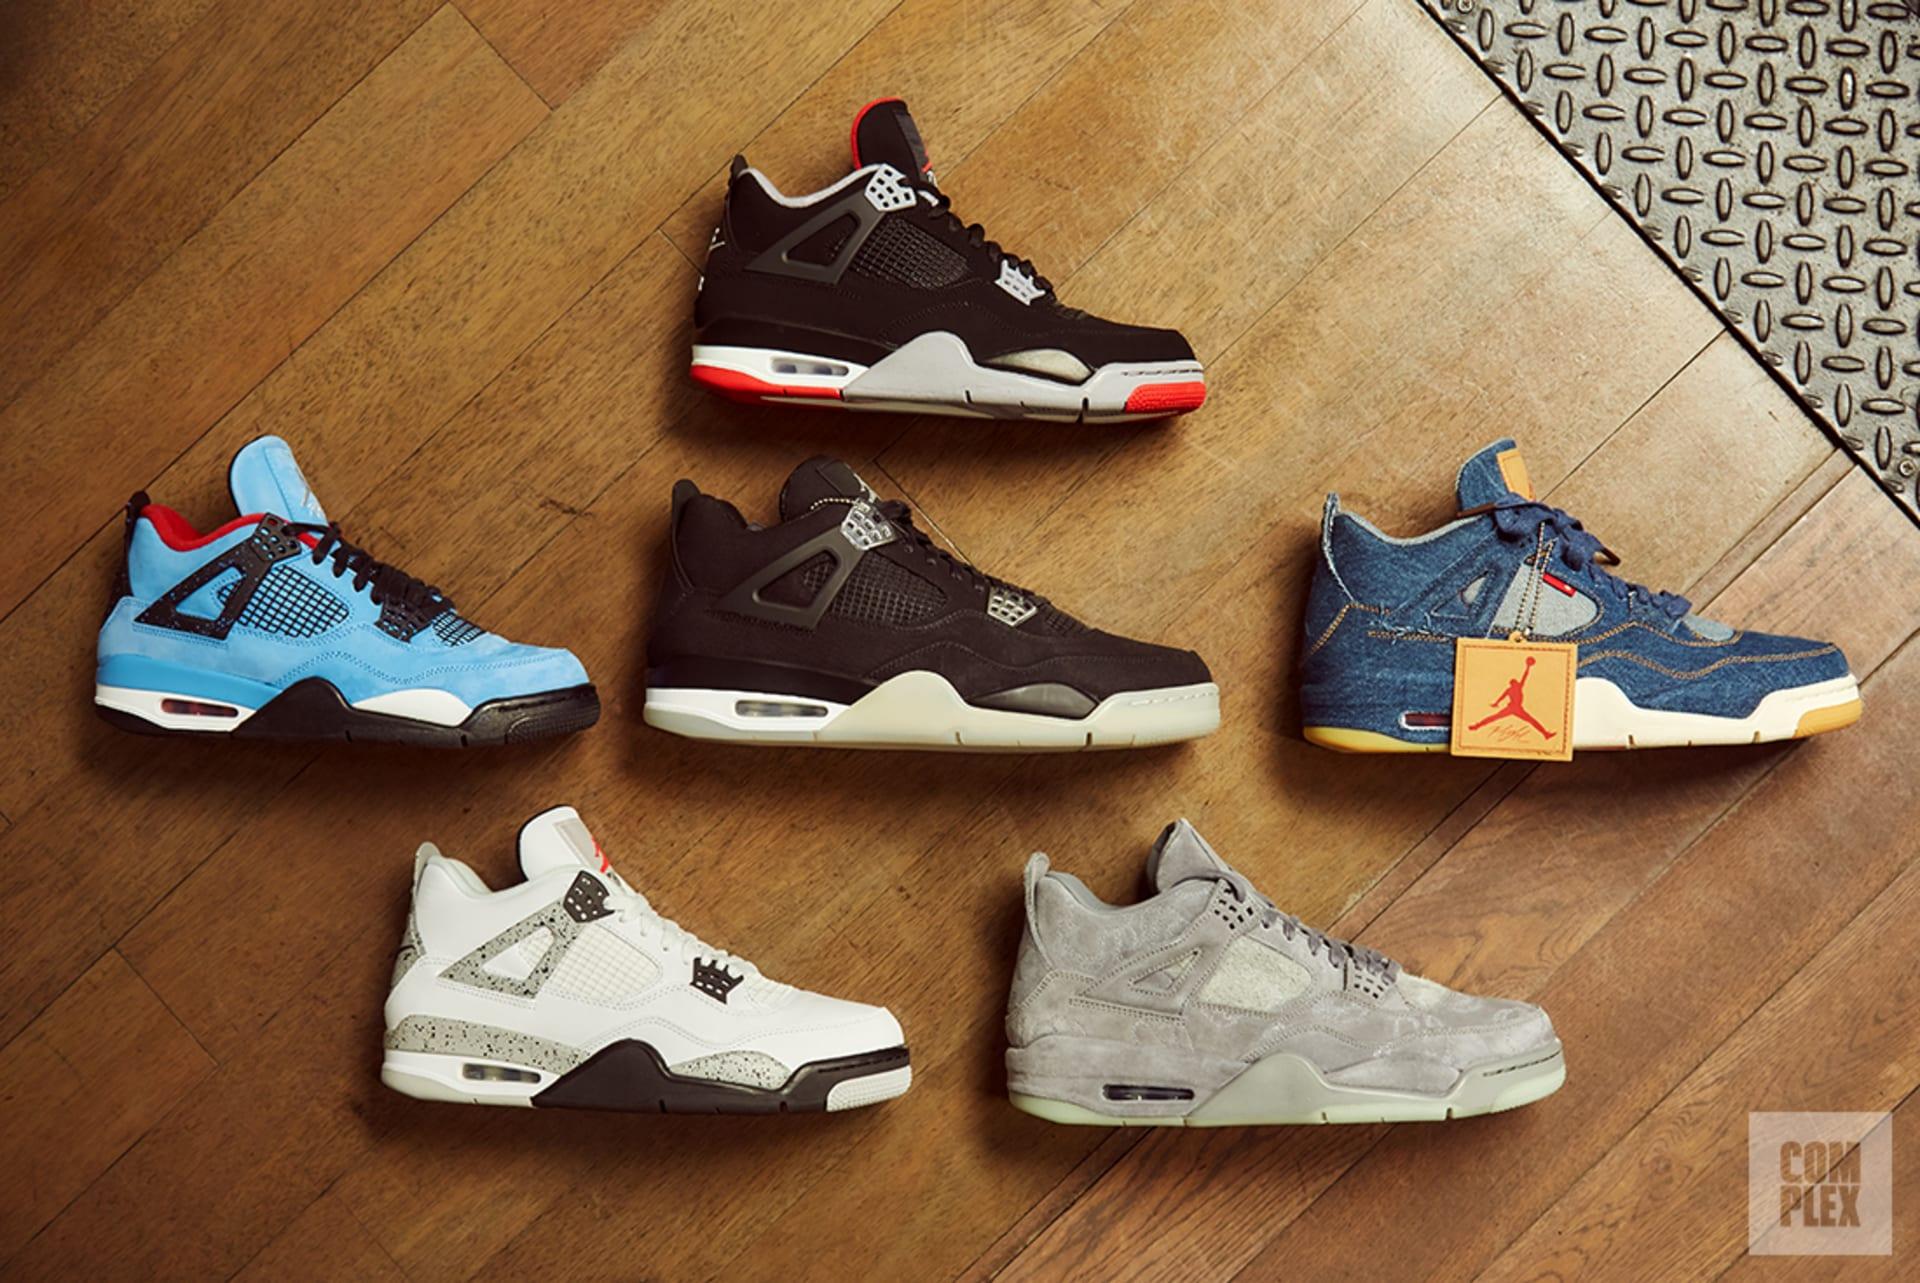 sports shoes e9ad2 d563e Variety of Air Jordan IVs. Image via Complex Original David Cabrera. All  sneakers courtesy of Stadium Goods.